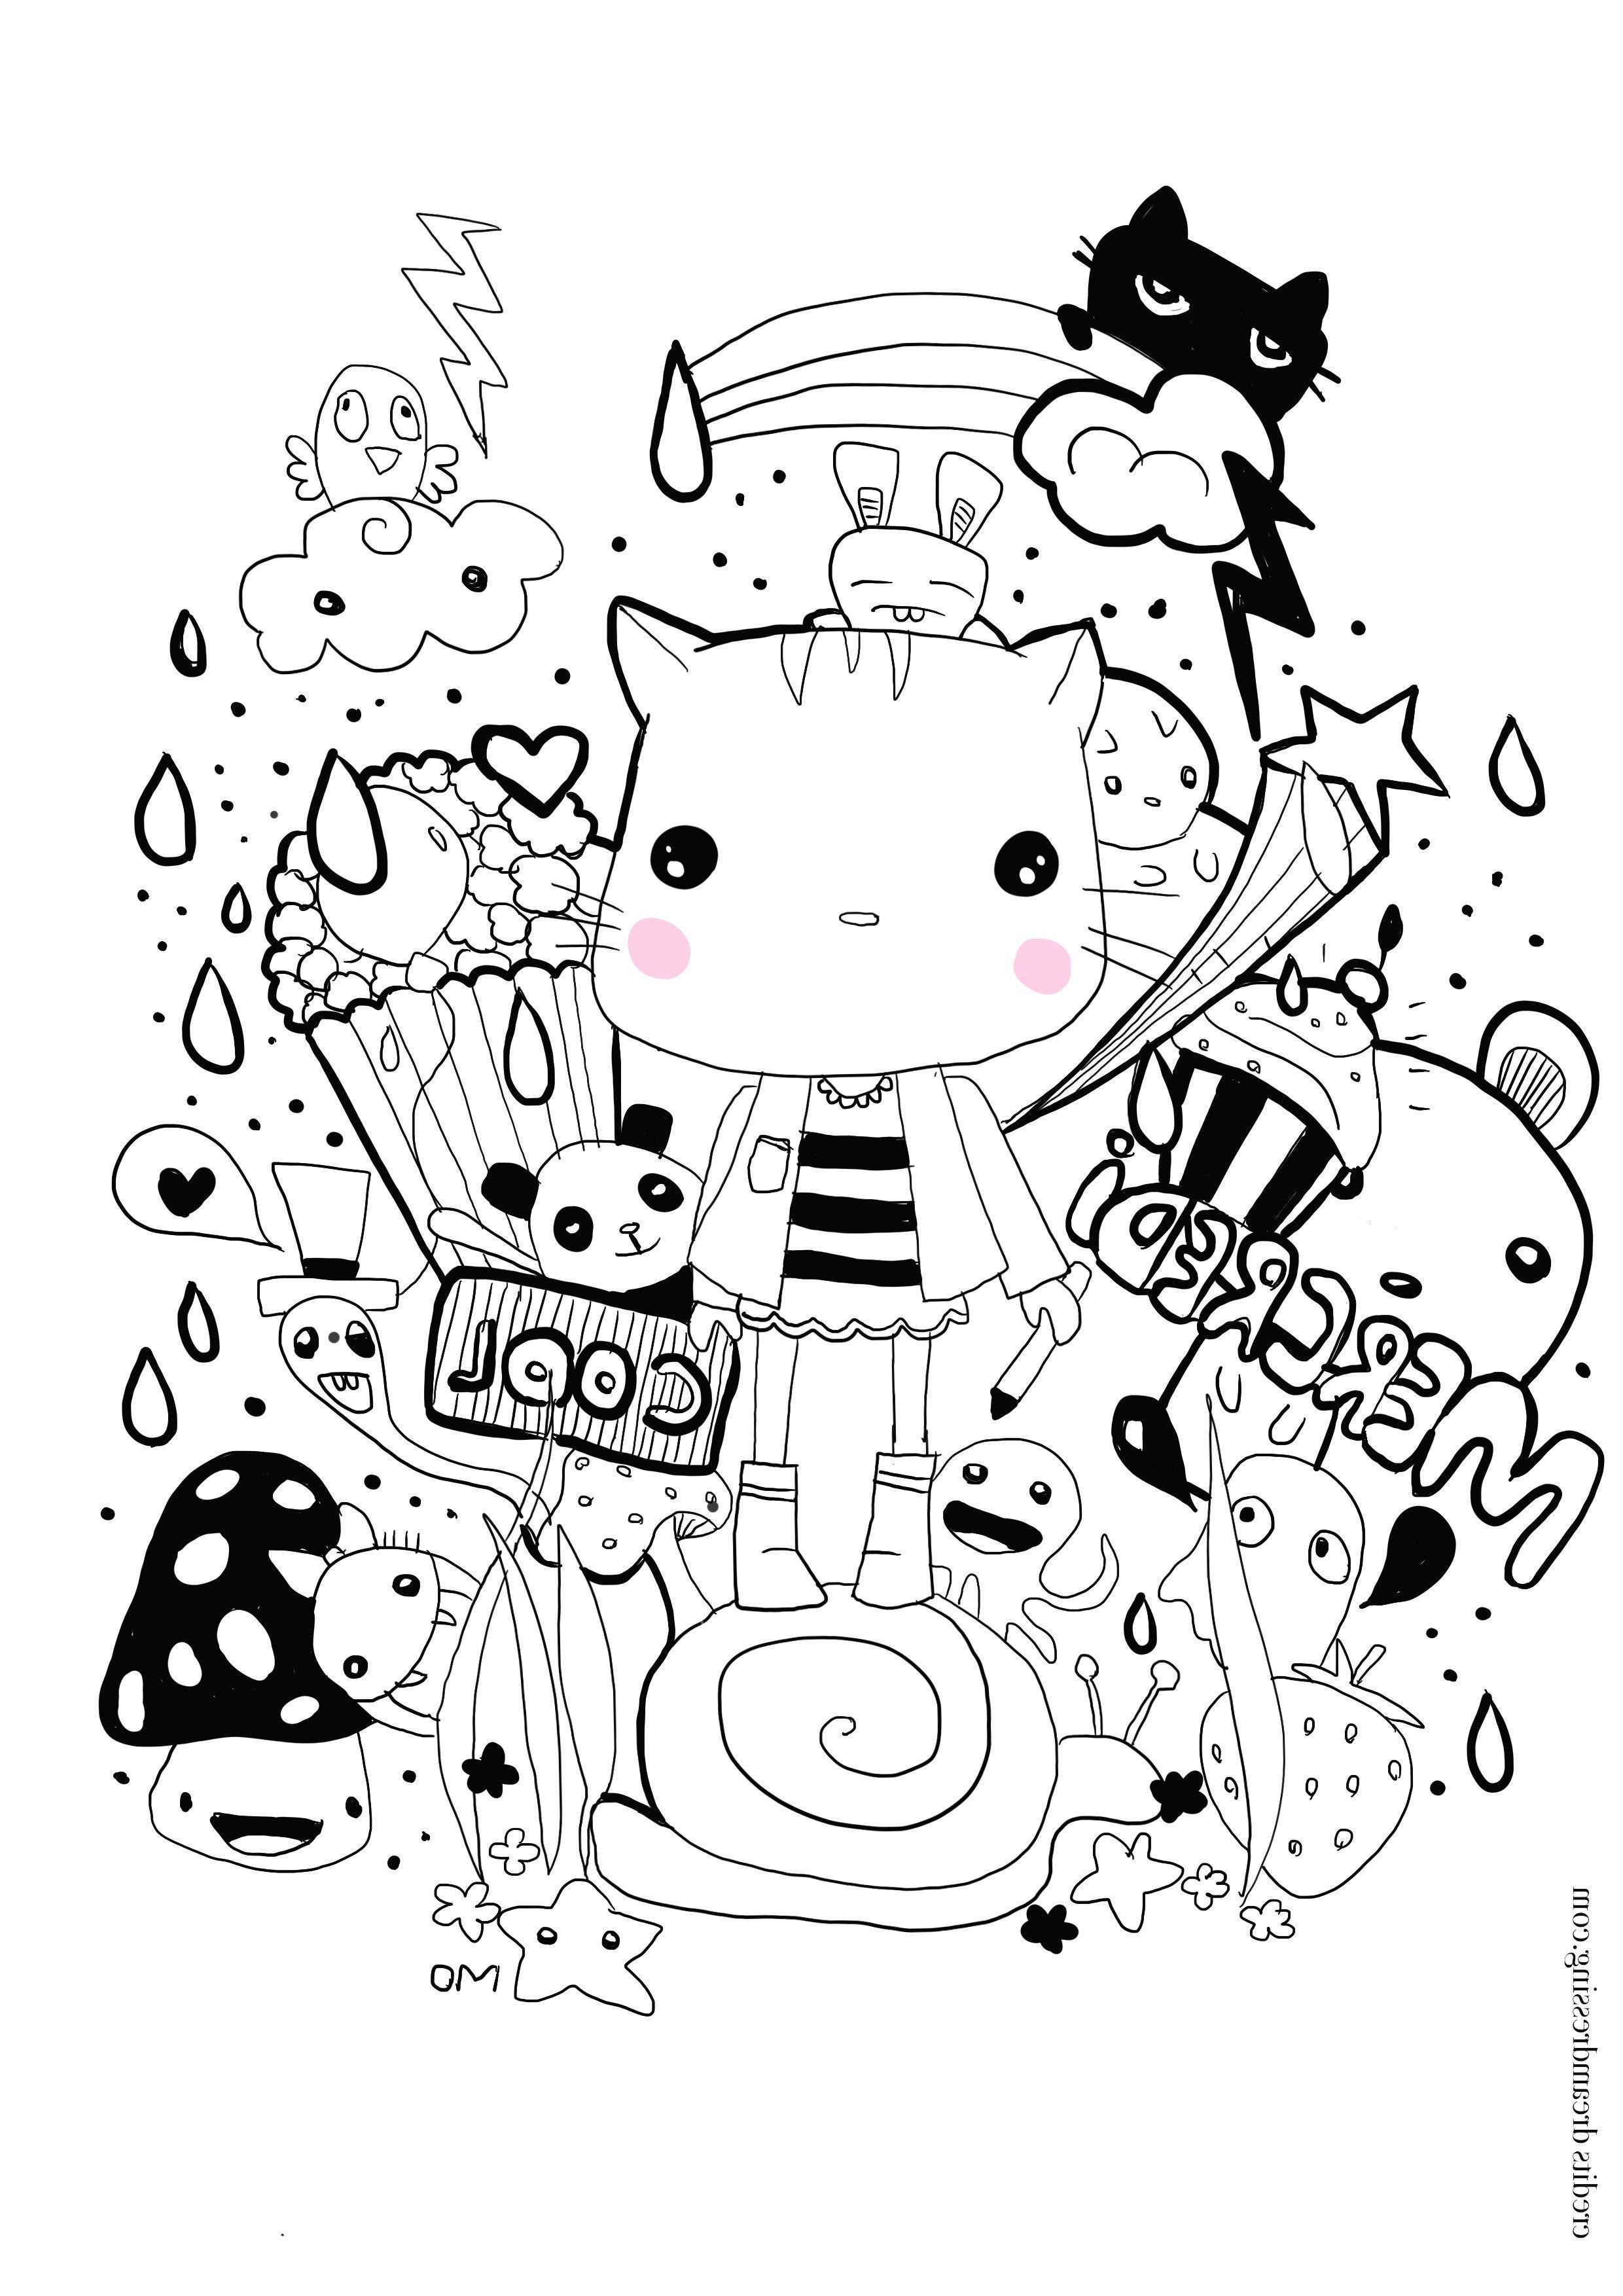 Dessin Kawaii A Imprimer : dessin, kawaii, imprimer, Coloriage, Dessin